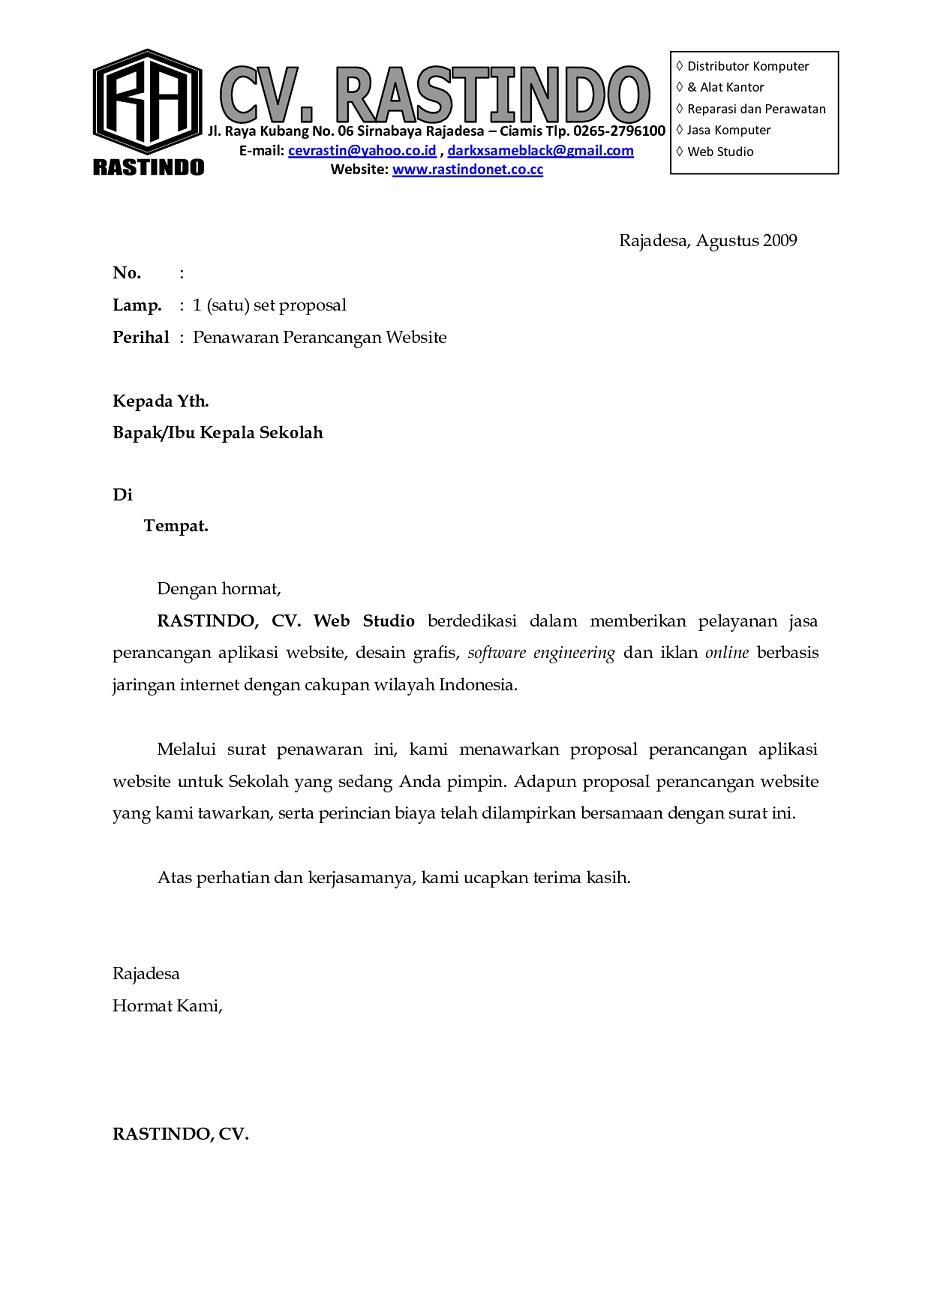 Contoh Surat dan Proposal Penawaran Jasa